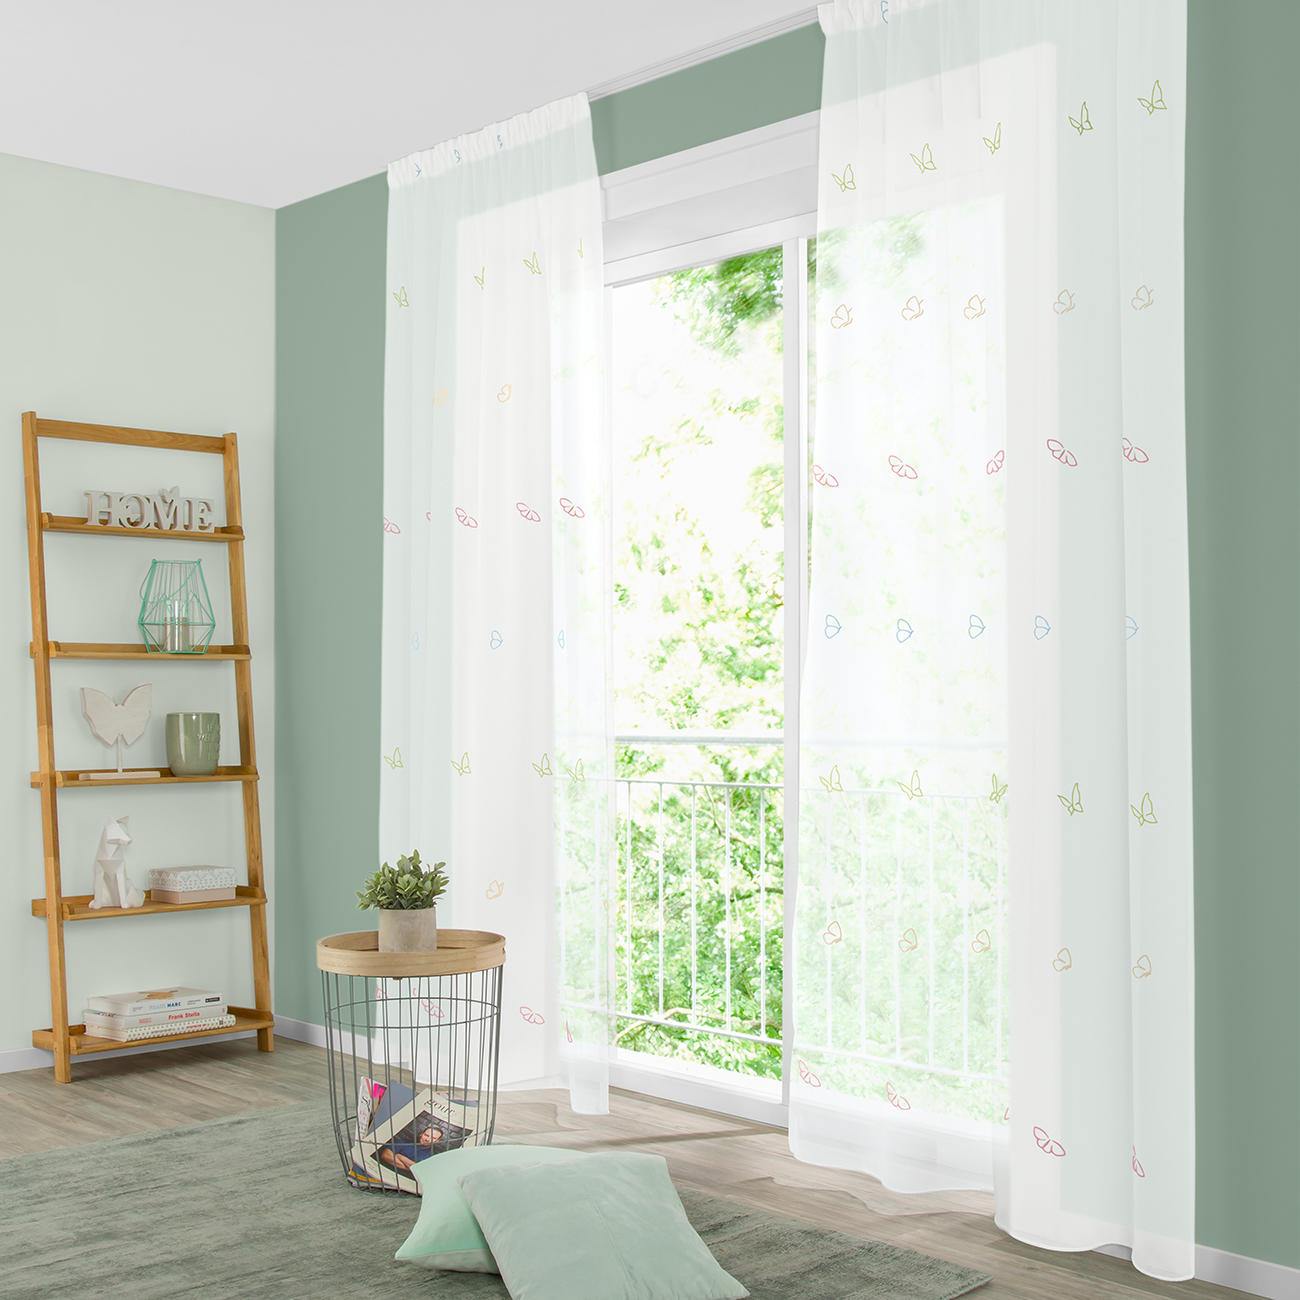 store honey 1 store vorh nge kaufen das kavaliershaus. Black Bedroom Furniture Sets. Home Design Ideas